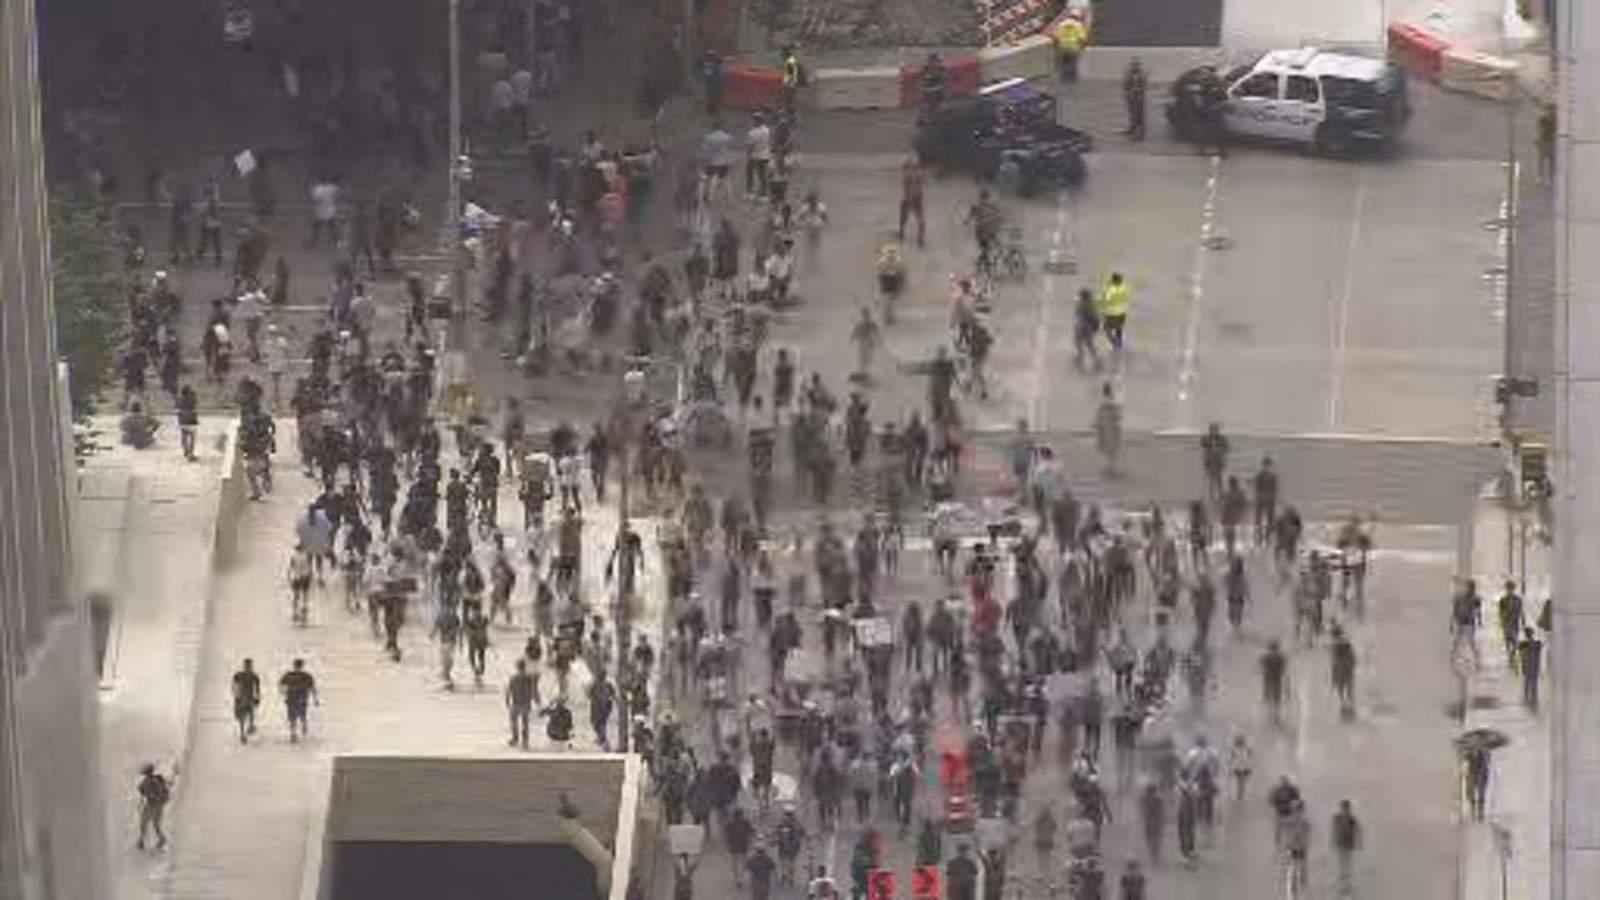 houston protest - photo #48